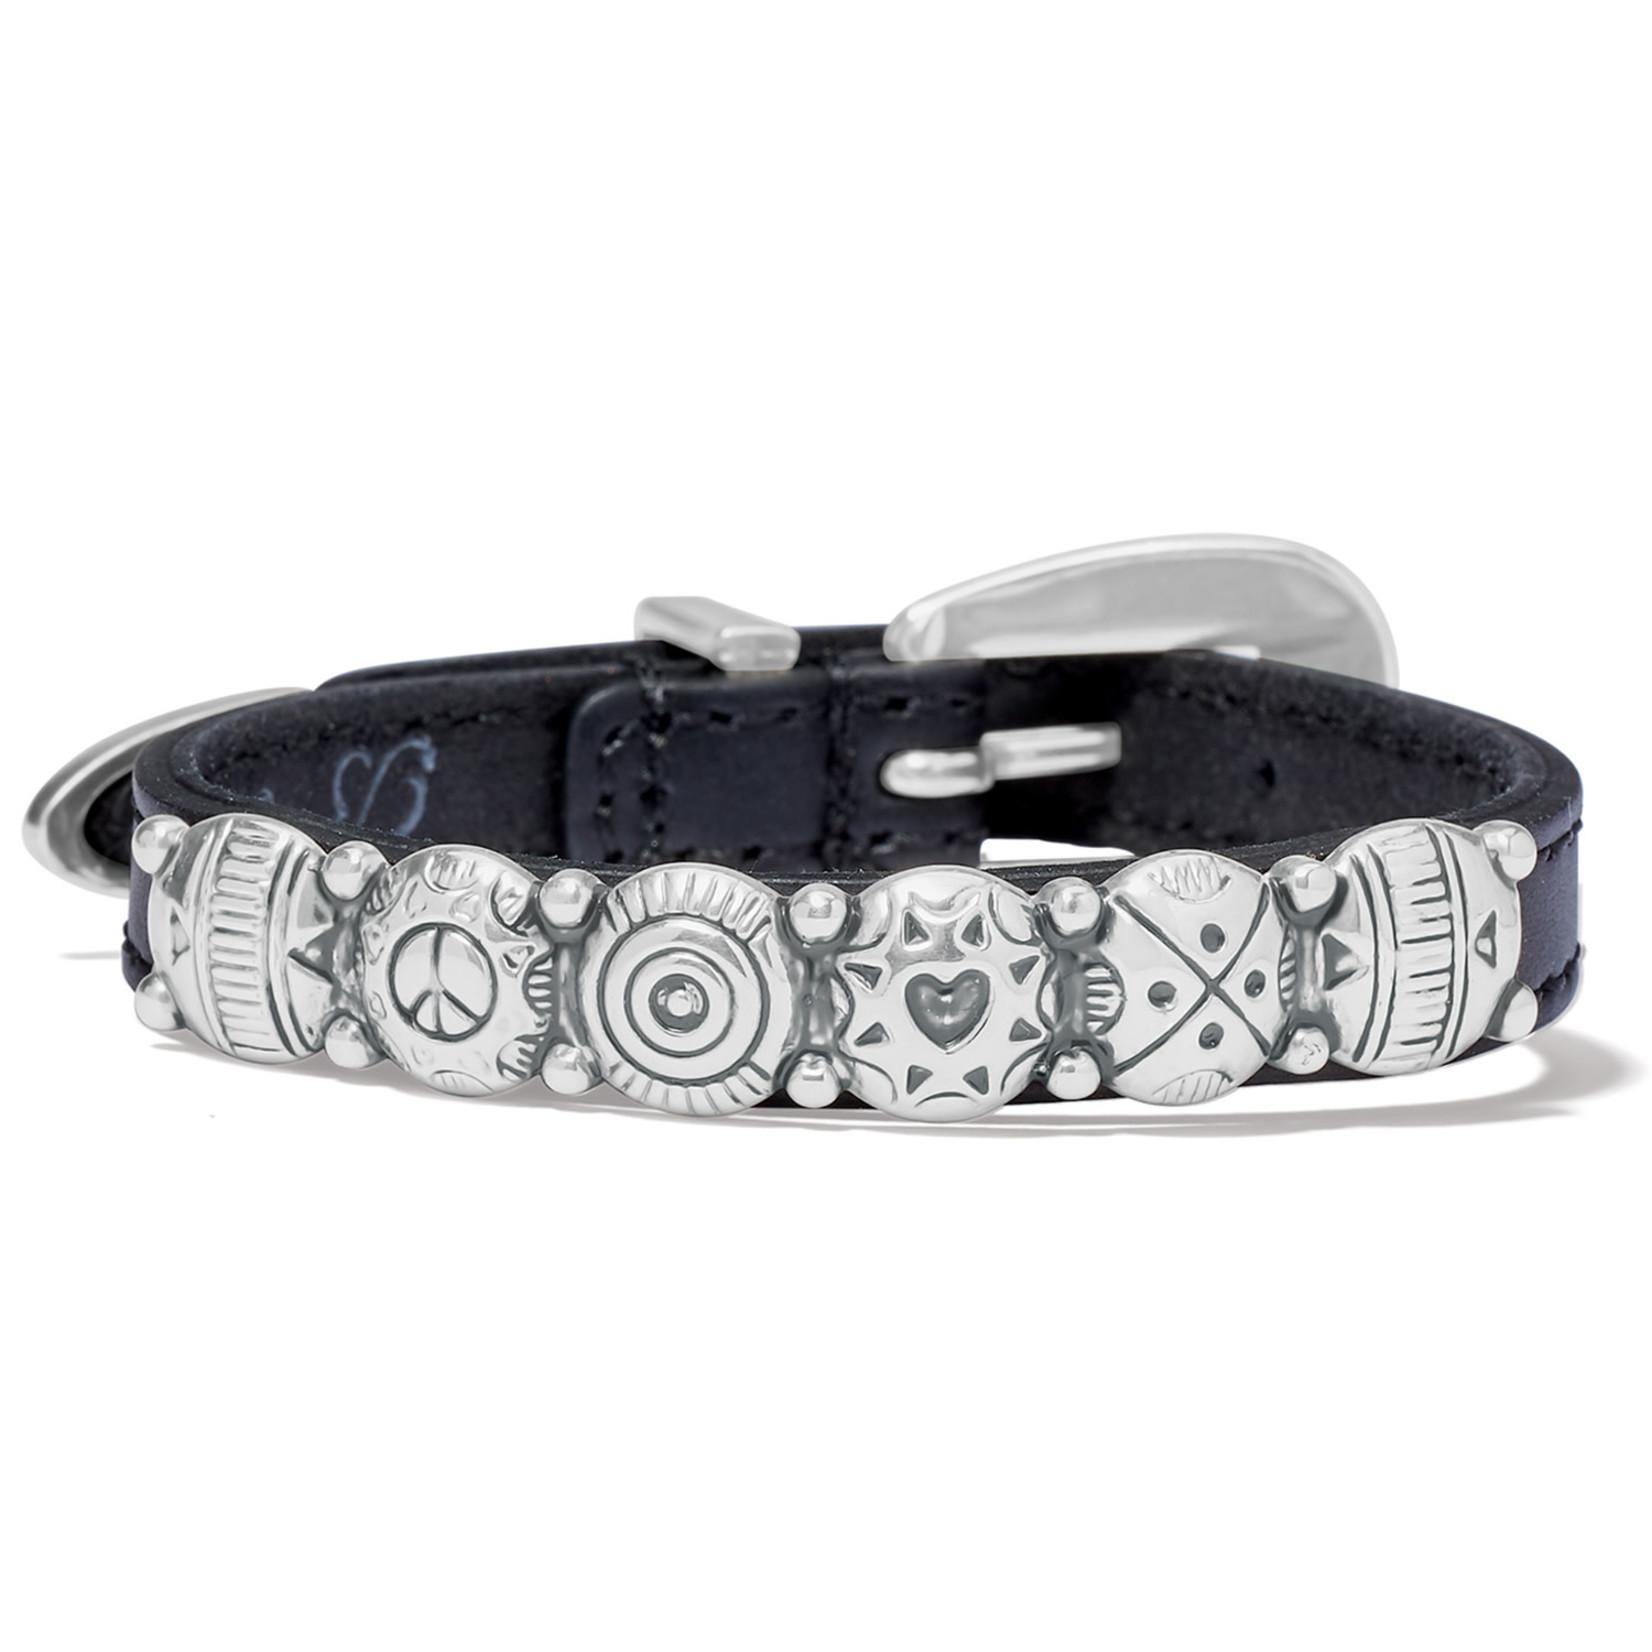 Brighton Harmony Bandit Bracelet - Black